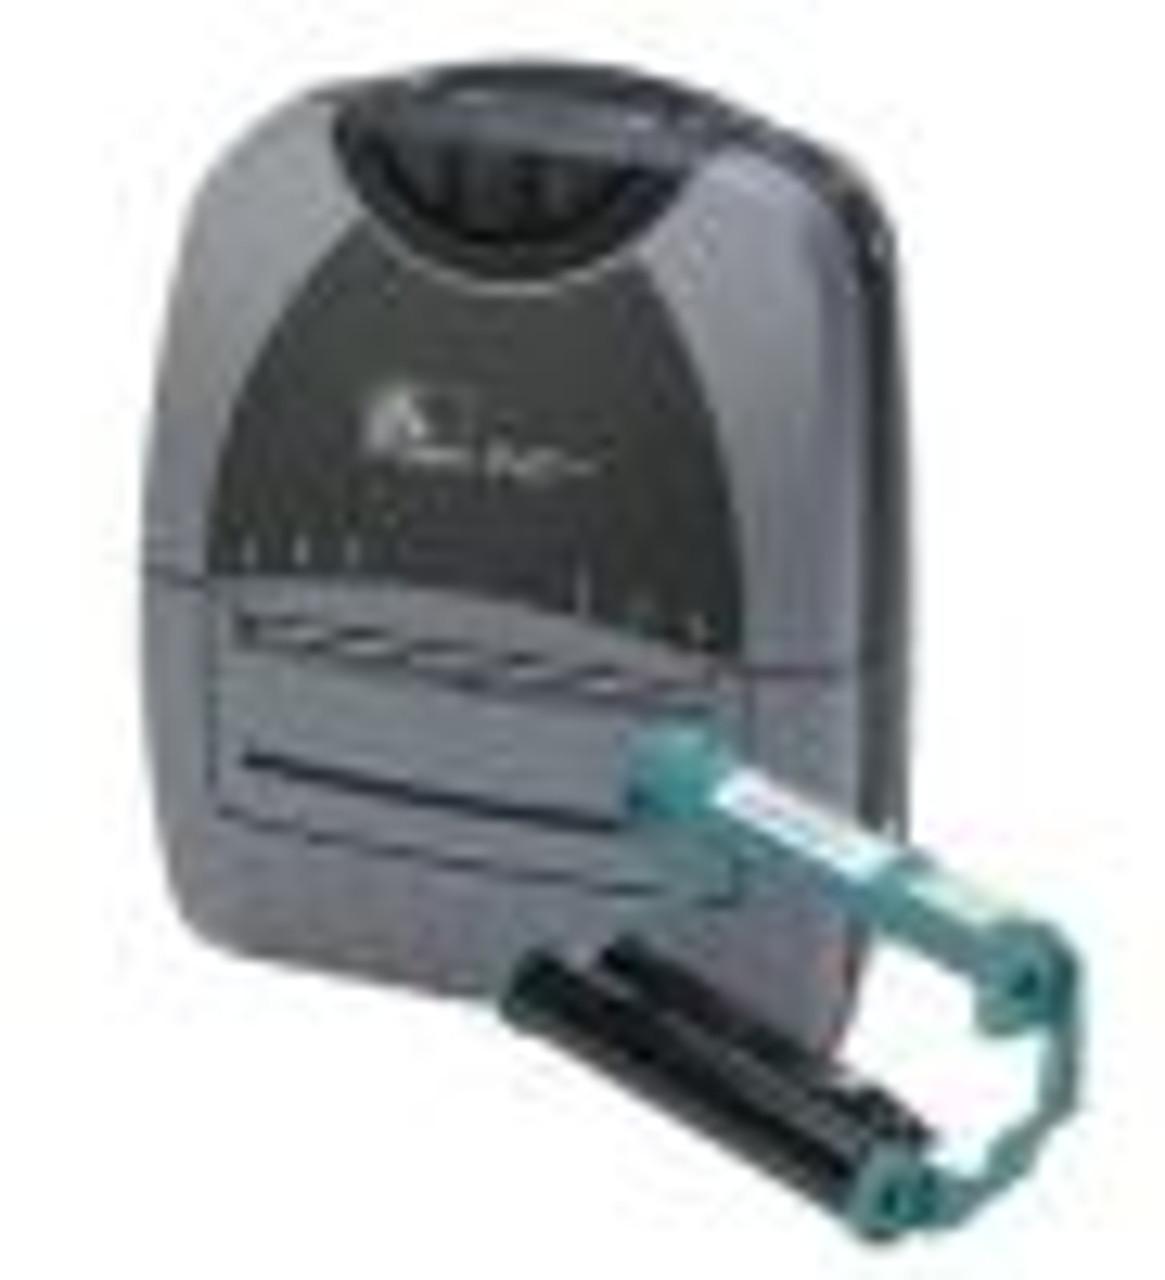 P4T Printers